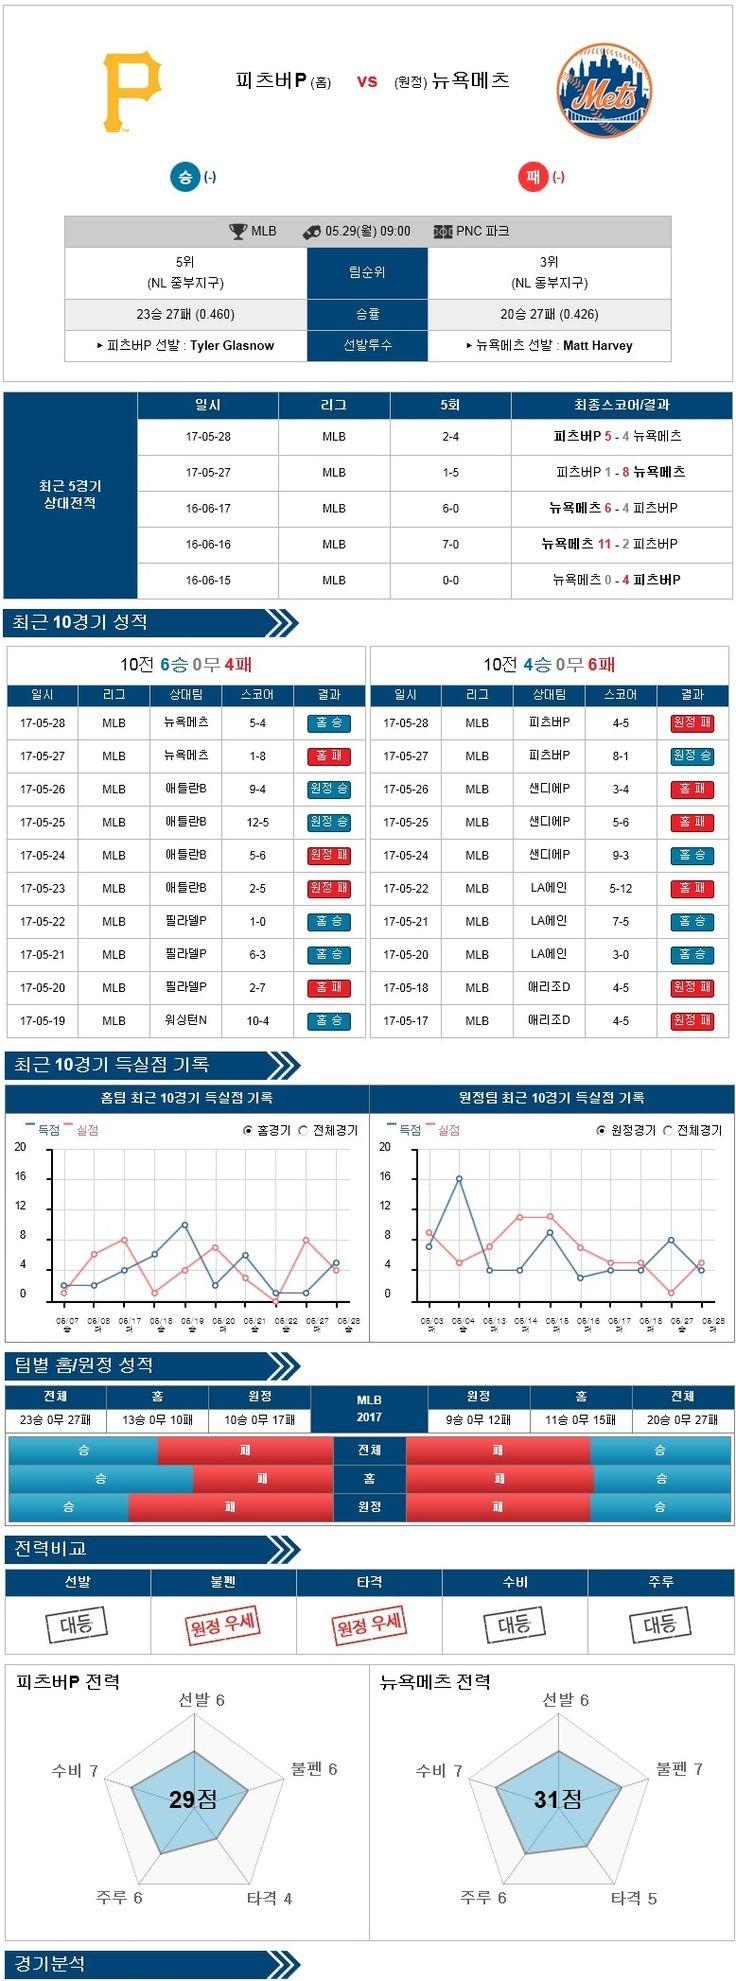 [MLB] 5월 29일 피츠버그 vs 뉴욕메츠 ★토토군 분석★